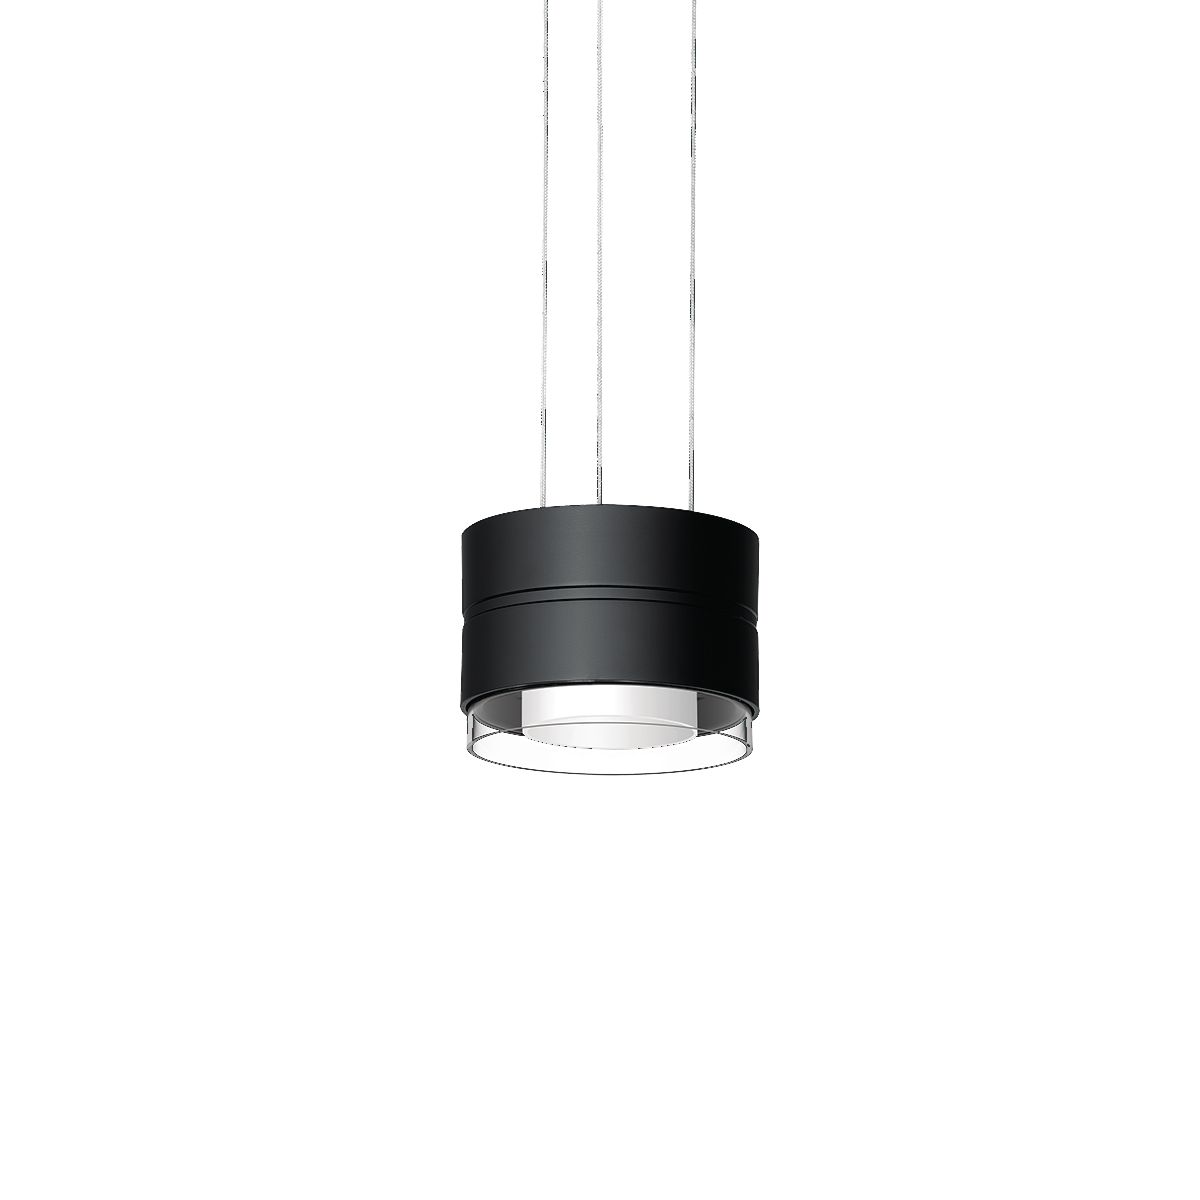 Inde-Pendant 32 LED Cylinder Pendant Indirect/Direct | Brand ...